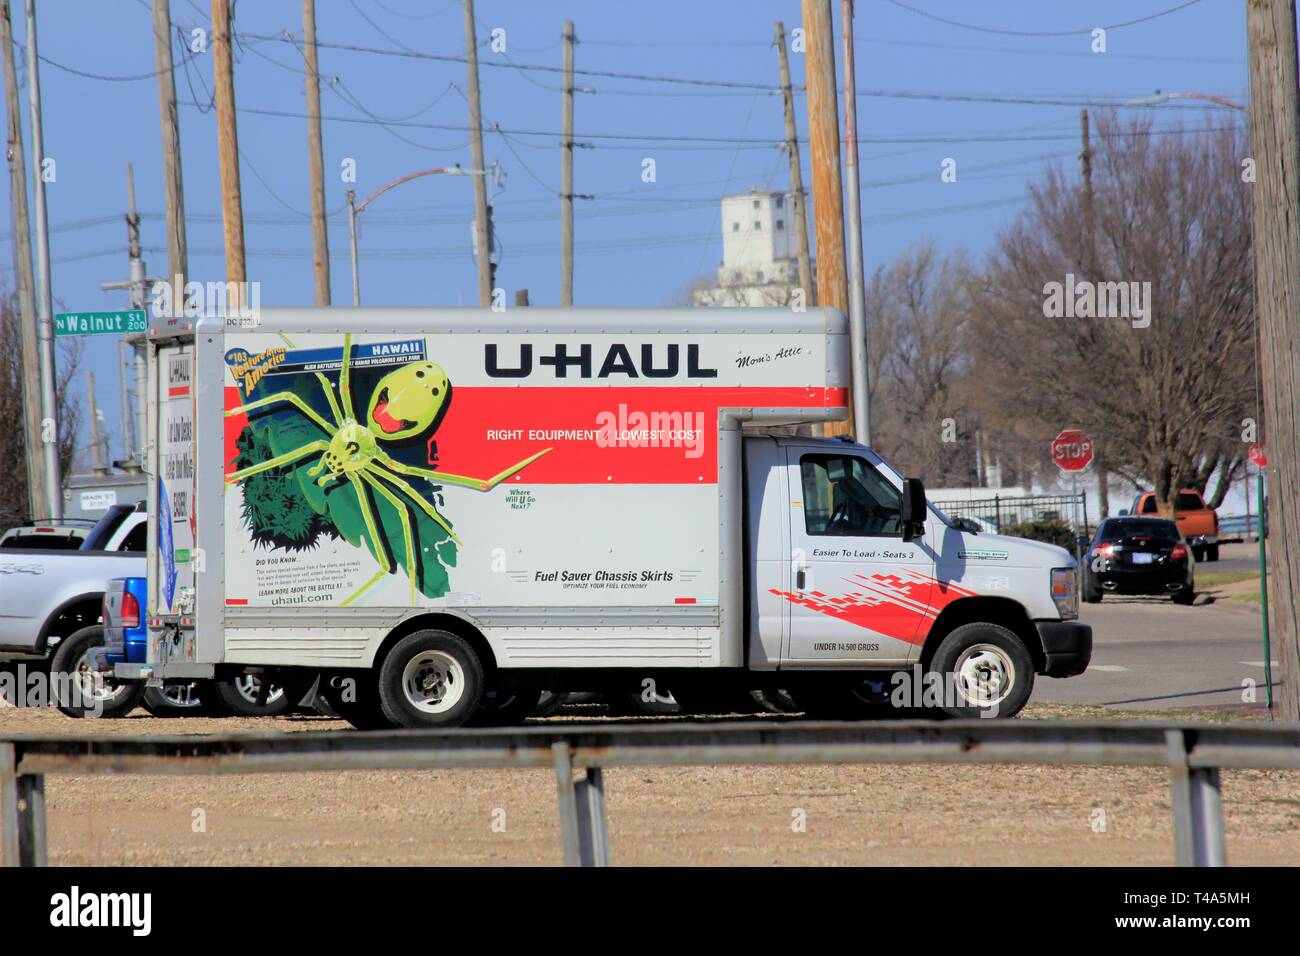 U Haul Truck Stockfotos & U Haul Truck Bilder Alamy